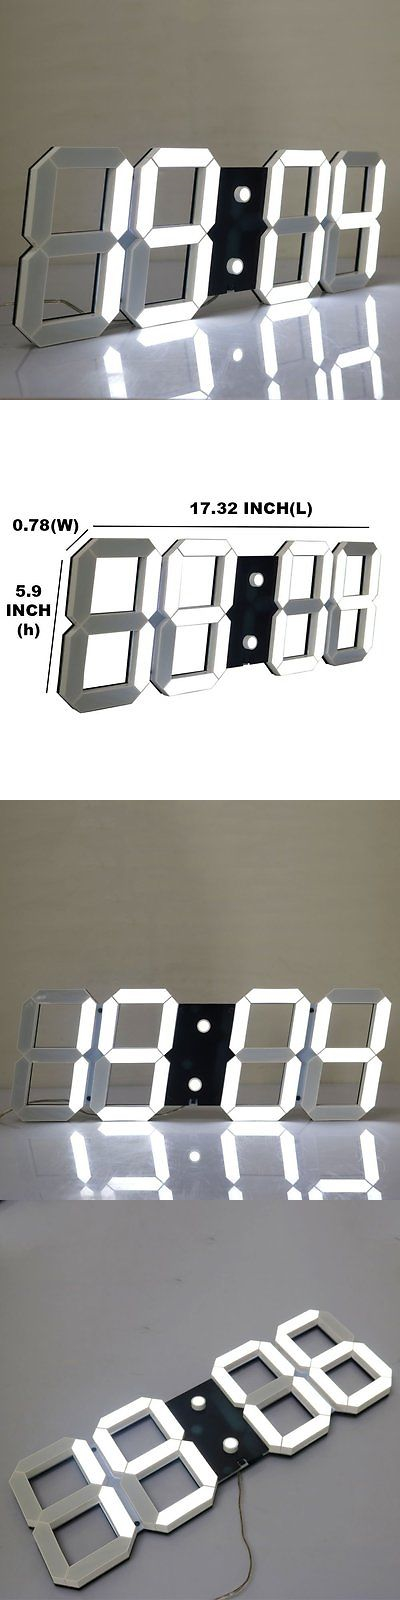 Alarm Clocks 79643 Chihai Silent Multifunctional Jumbo Led Digital